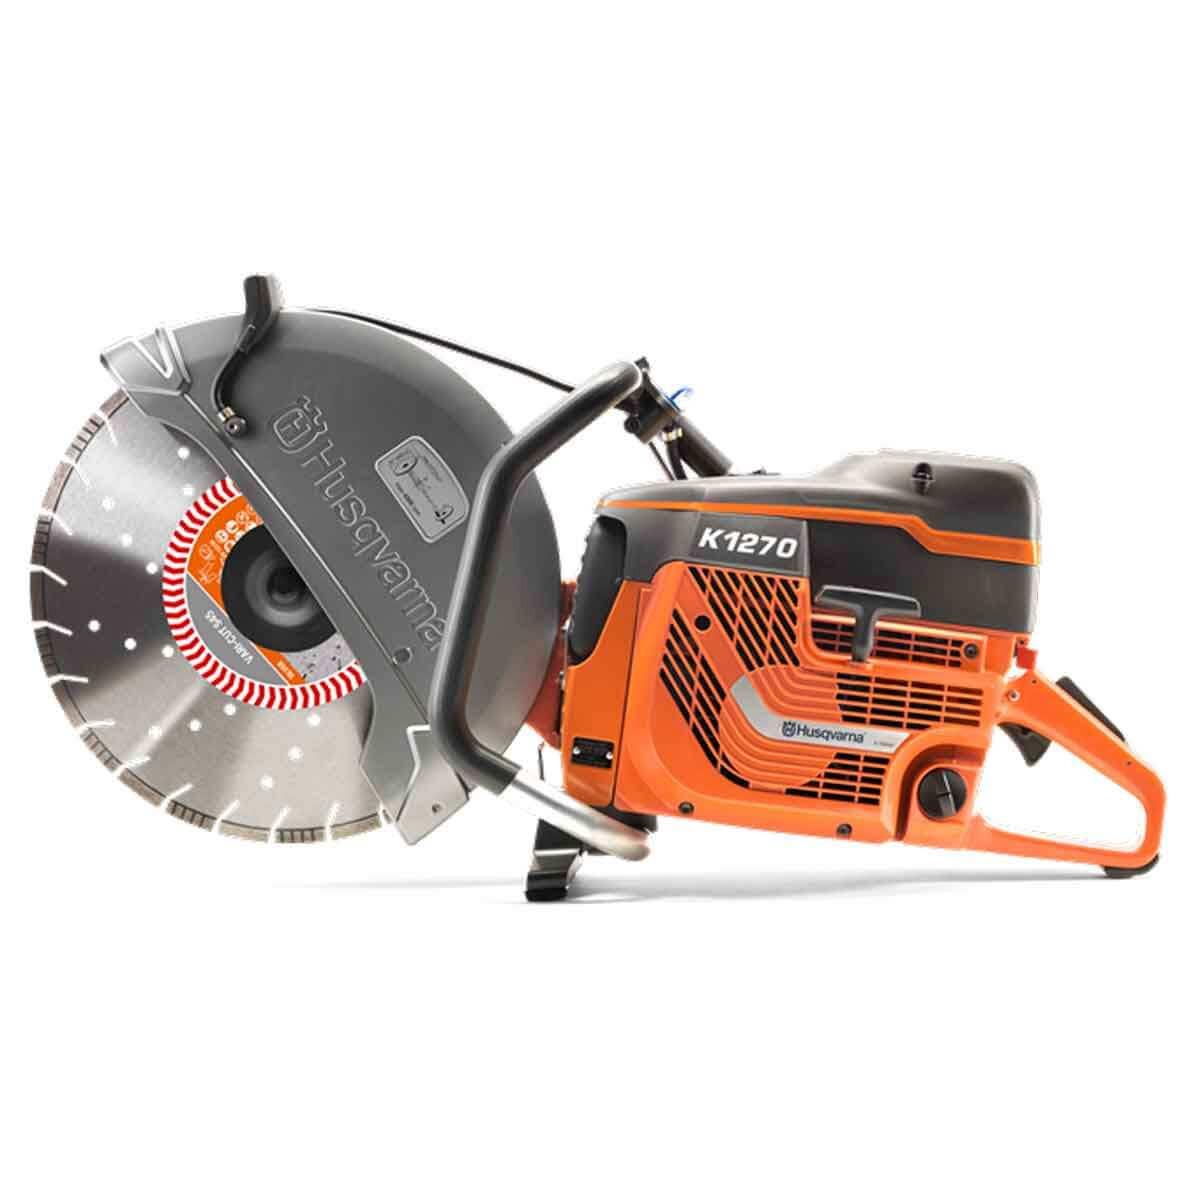 Husqvarna K1260 power cutter